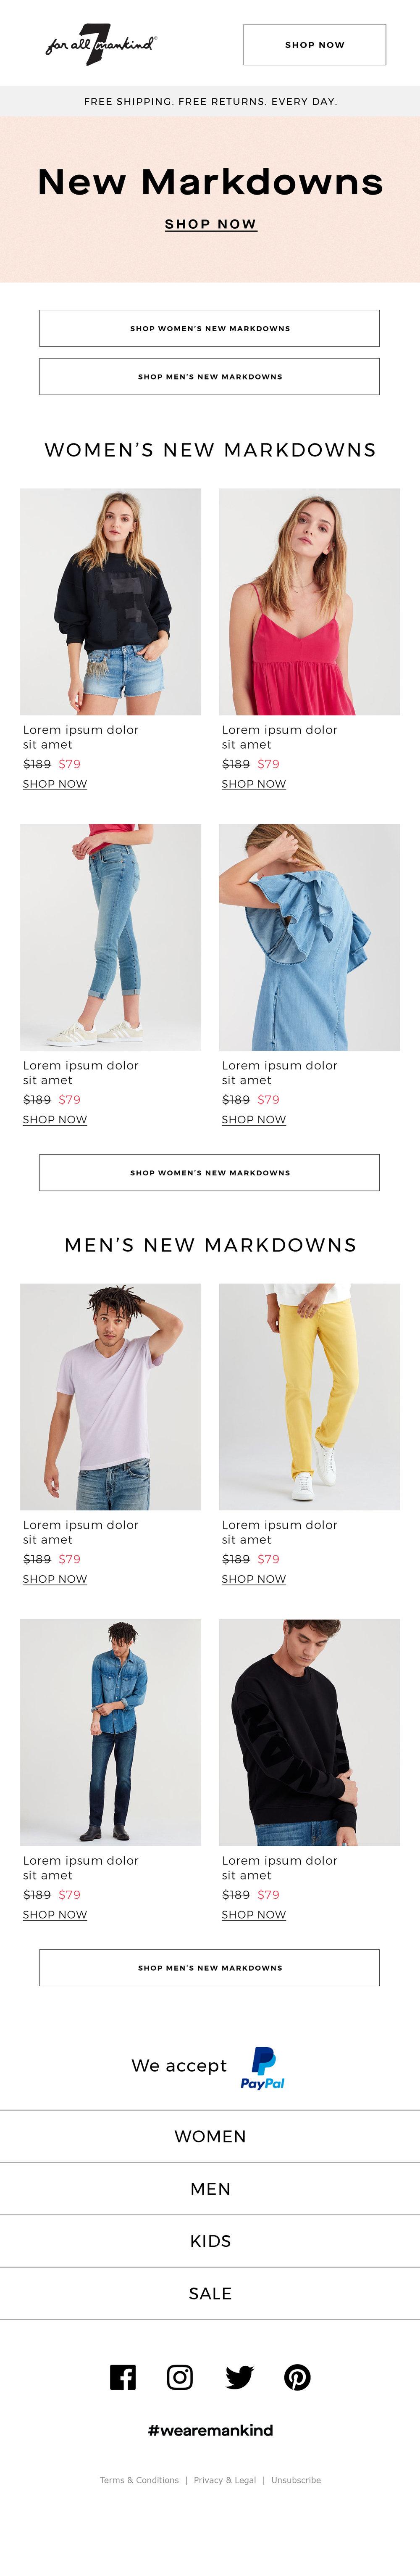 New Markdowns